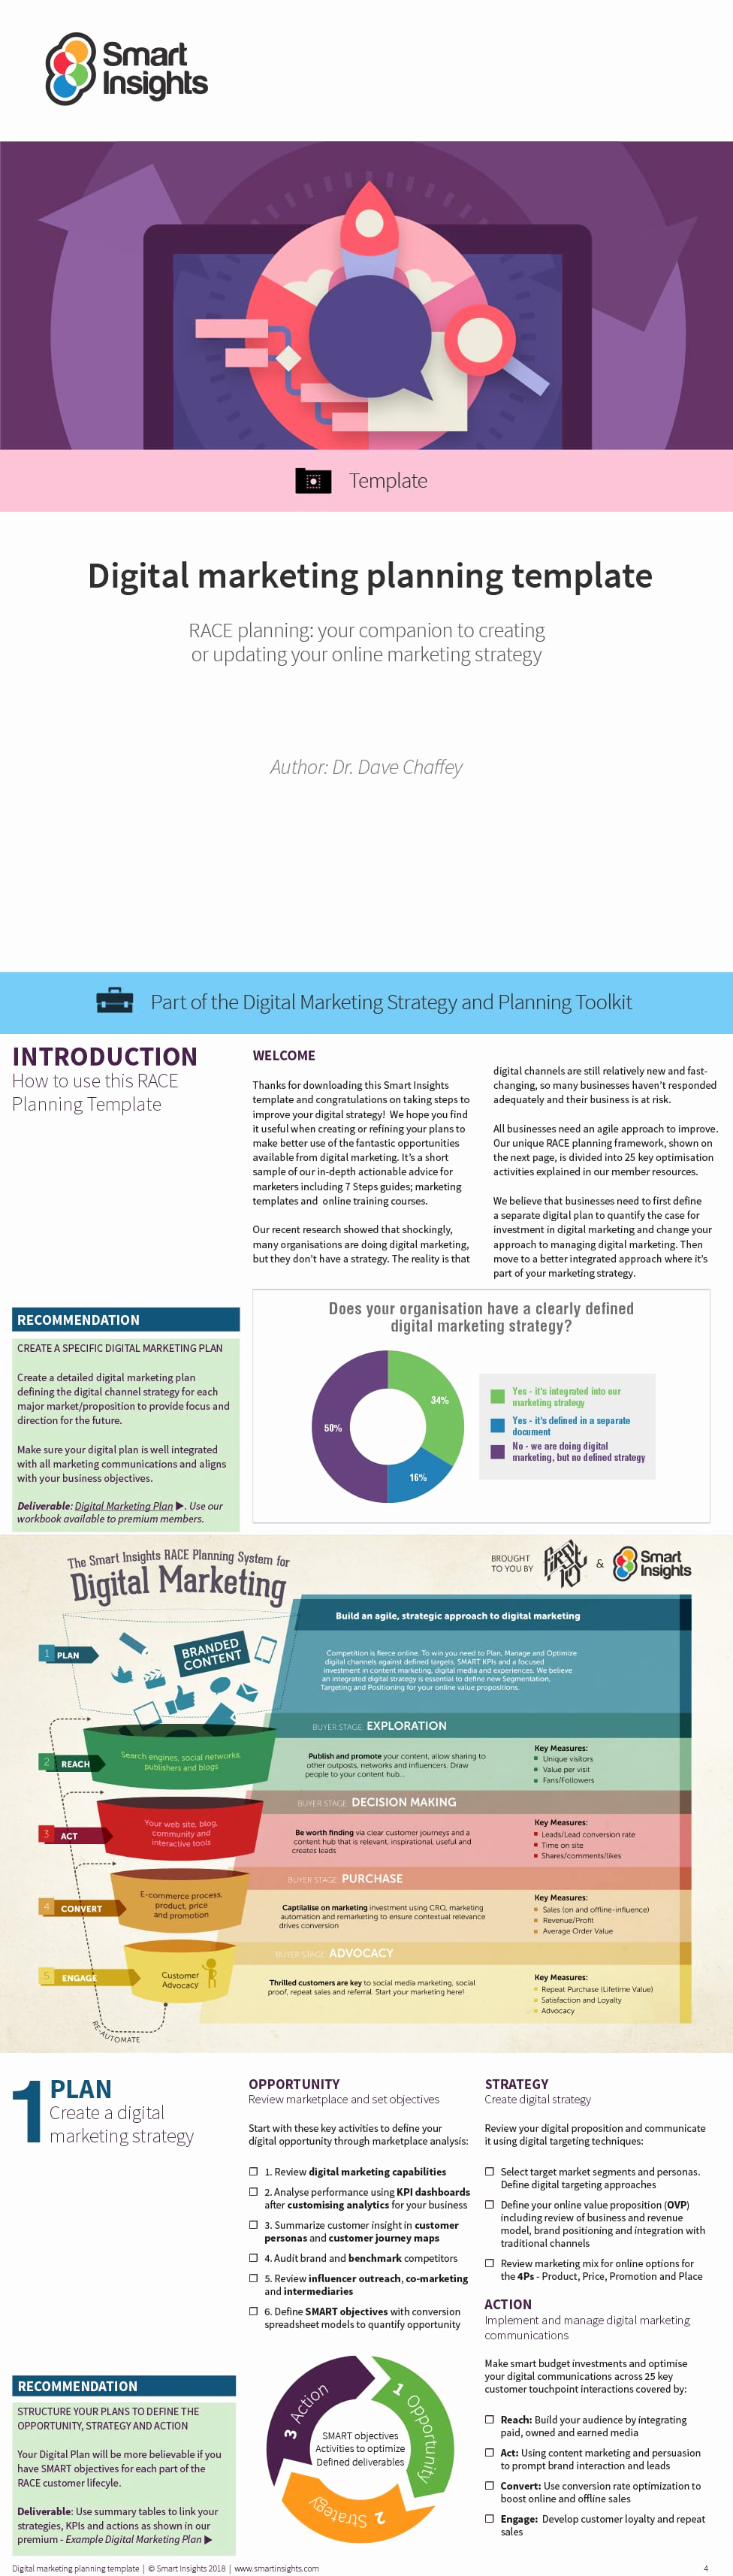 Digital Marketing Plan Template Beautiful Free Digital Marketing Plan Template Smart Insights